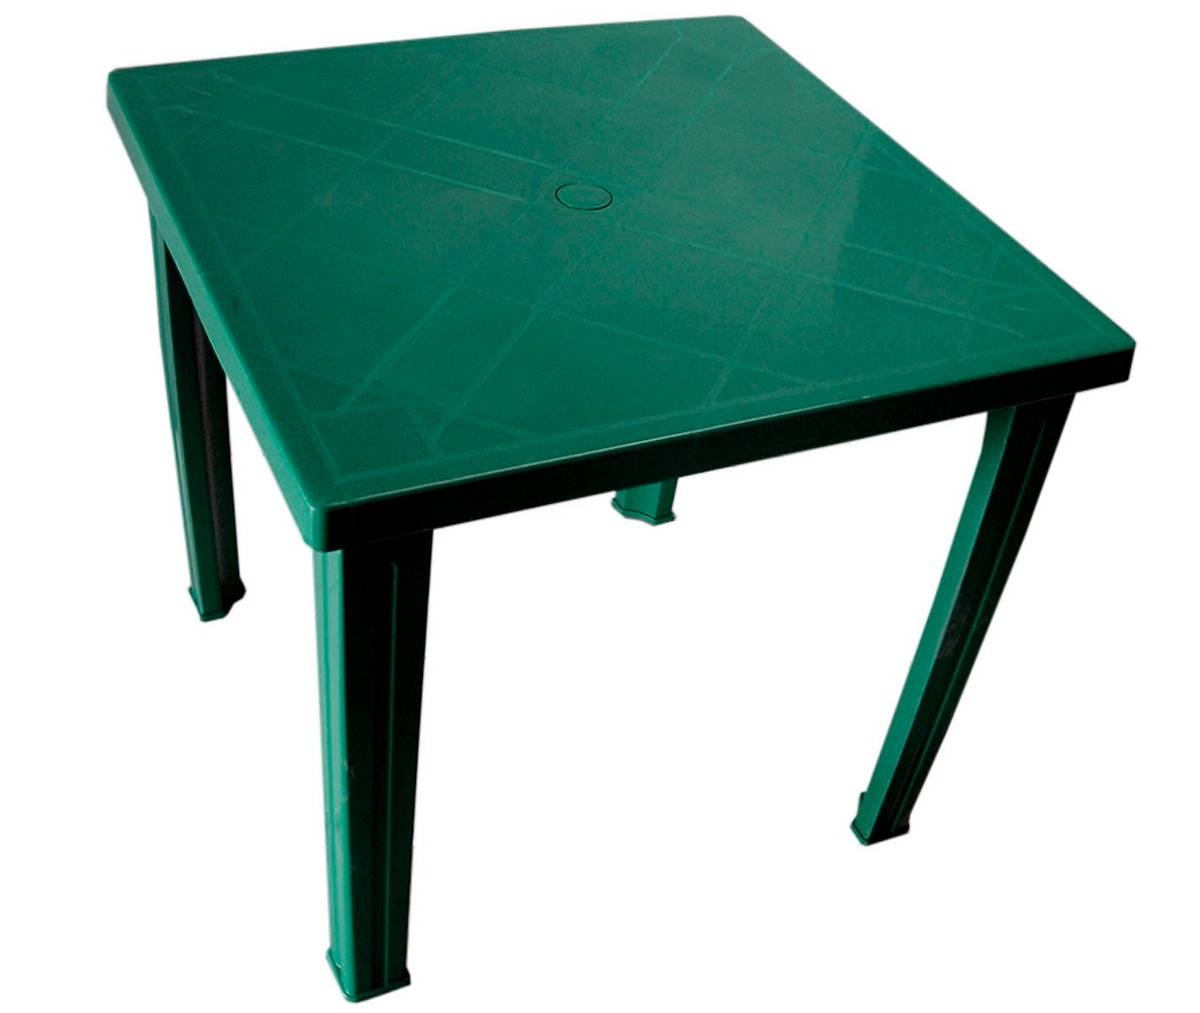 Mesa de plastico fram cuadrada verde en for Mesa plastico jardin